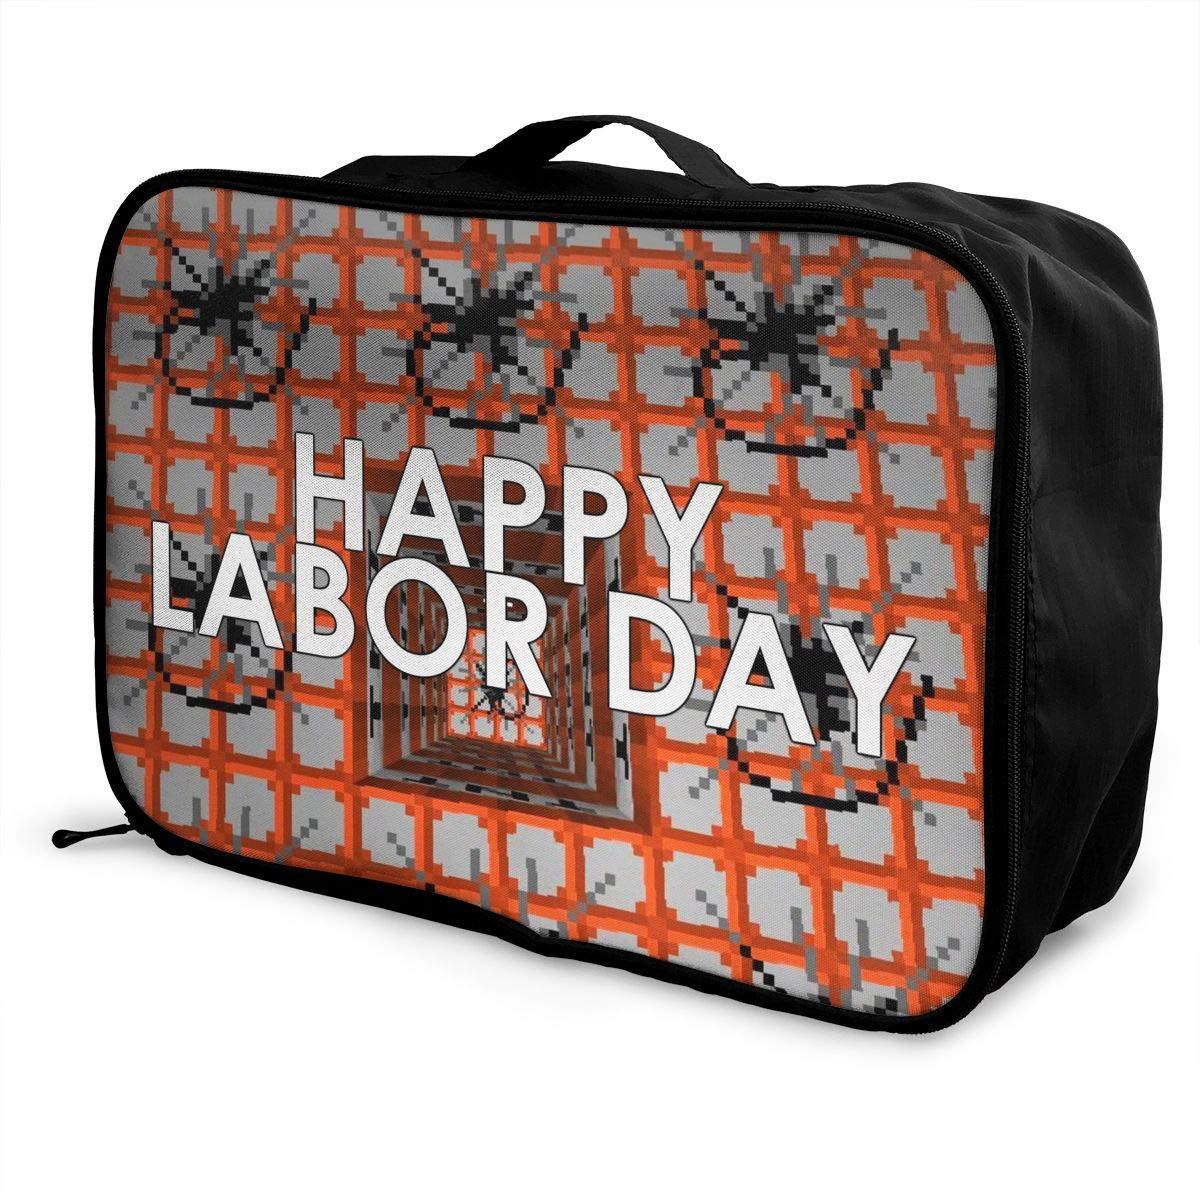 Travel Luggage Duffle Bag Lightweight Portable Handbag Labor Day Large Capacity Waterproof Foldable Storage Tote